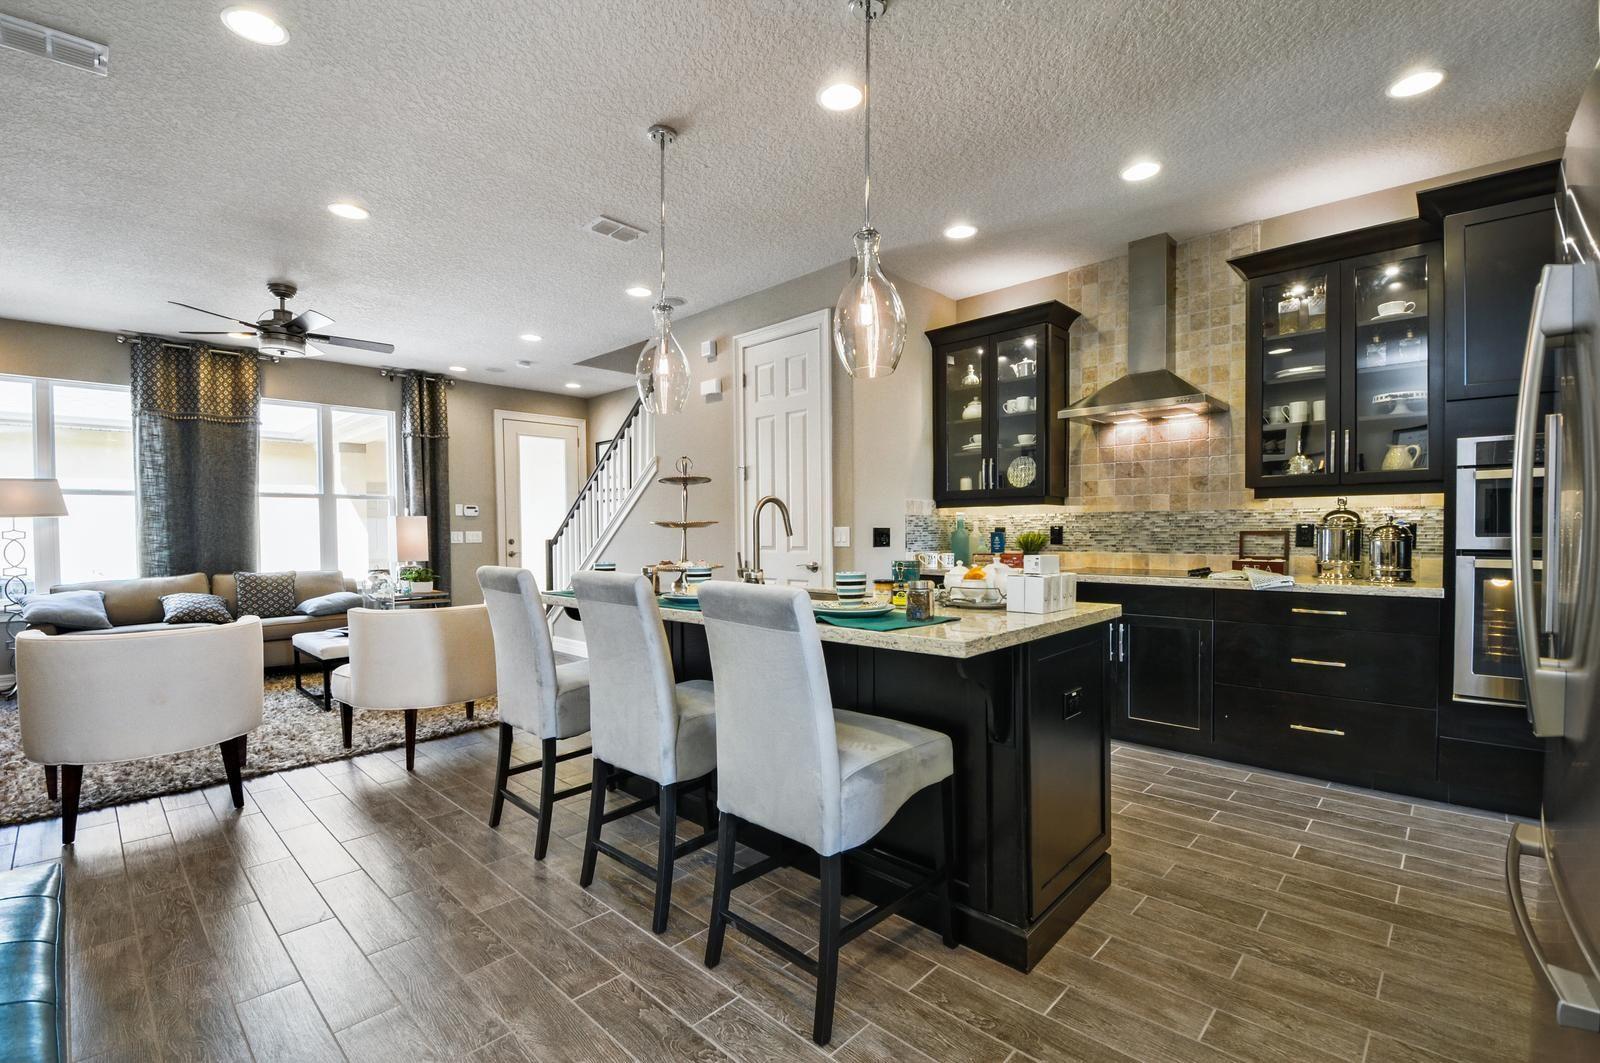 Orlando Model Homes Ikea Pendant Light Lighting Open Kitchen And Living Room